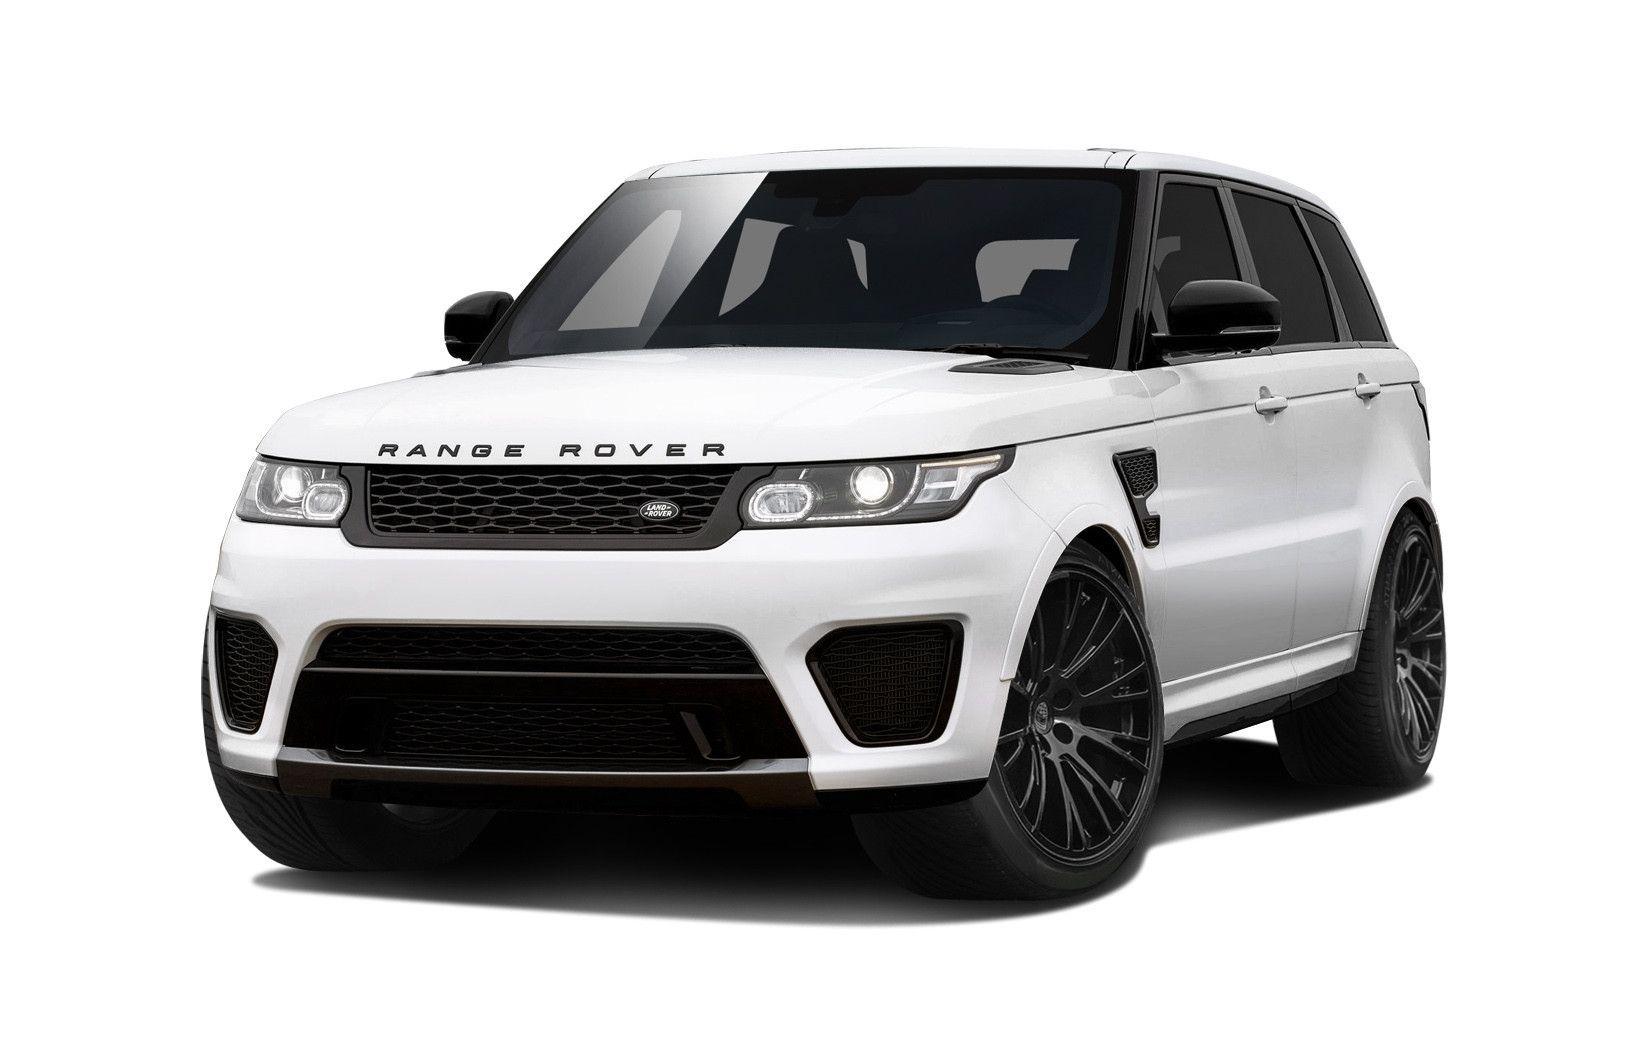 2014 2015 Land Rover Range Rover Sport Vaero Svr Look Body Kit 2 Pieces Range Rover Sport Land Rover Range Rover